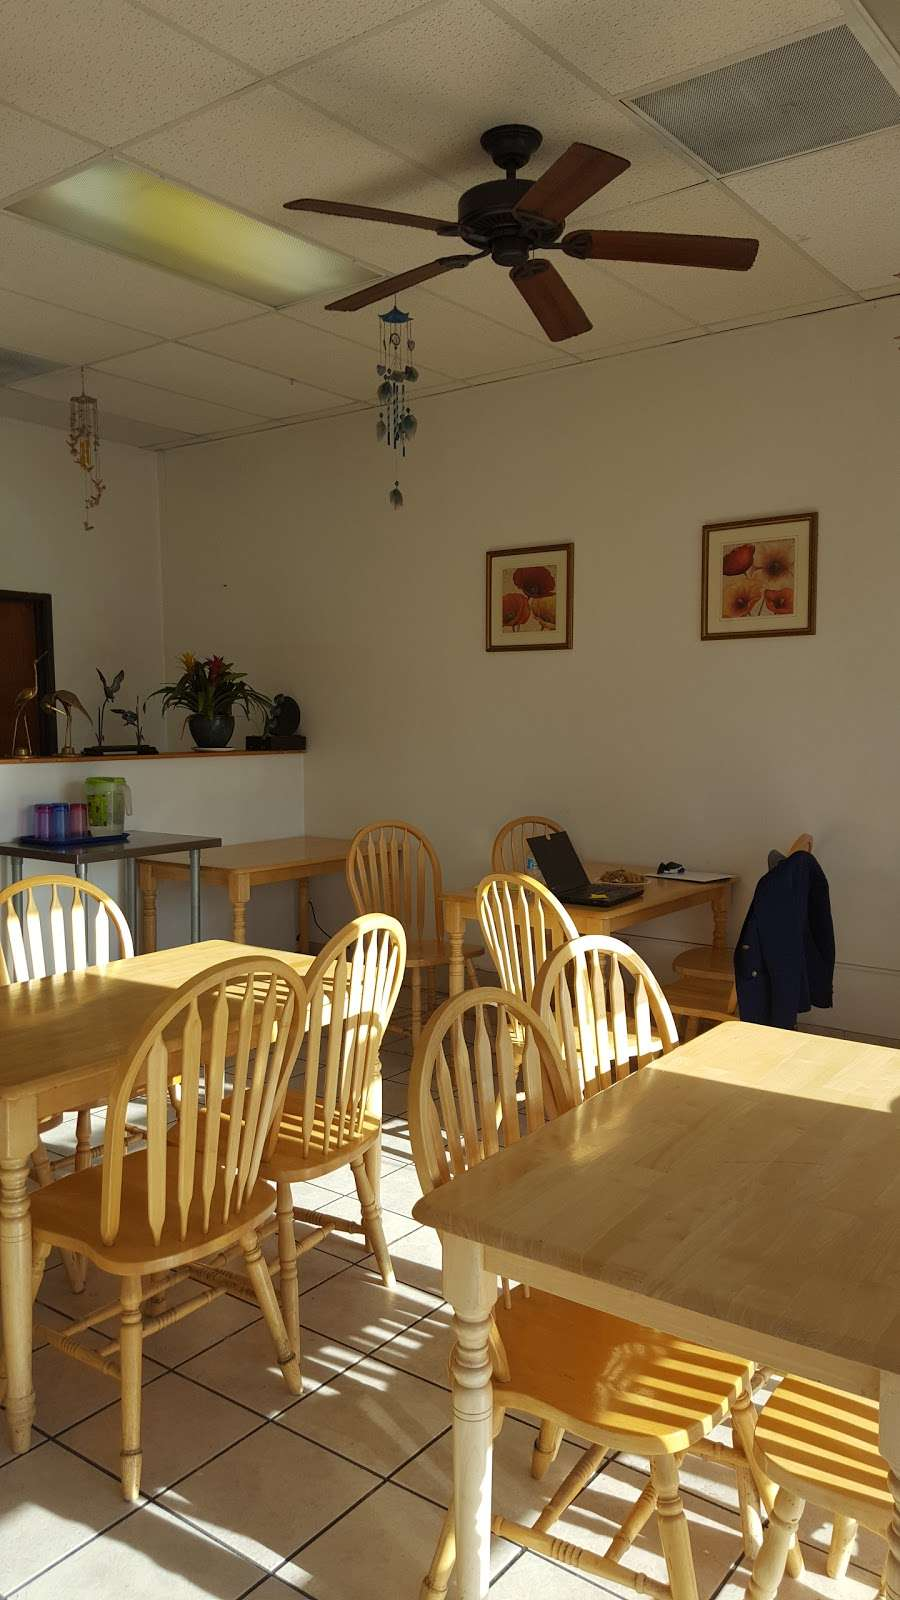 Ho Wei Chinese Restaurant - restaurant  | Photo 1 of 5 | Address: 7262 Broadway, Denver, CO 80221, USA | Phone: (303) 650-4880